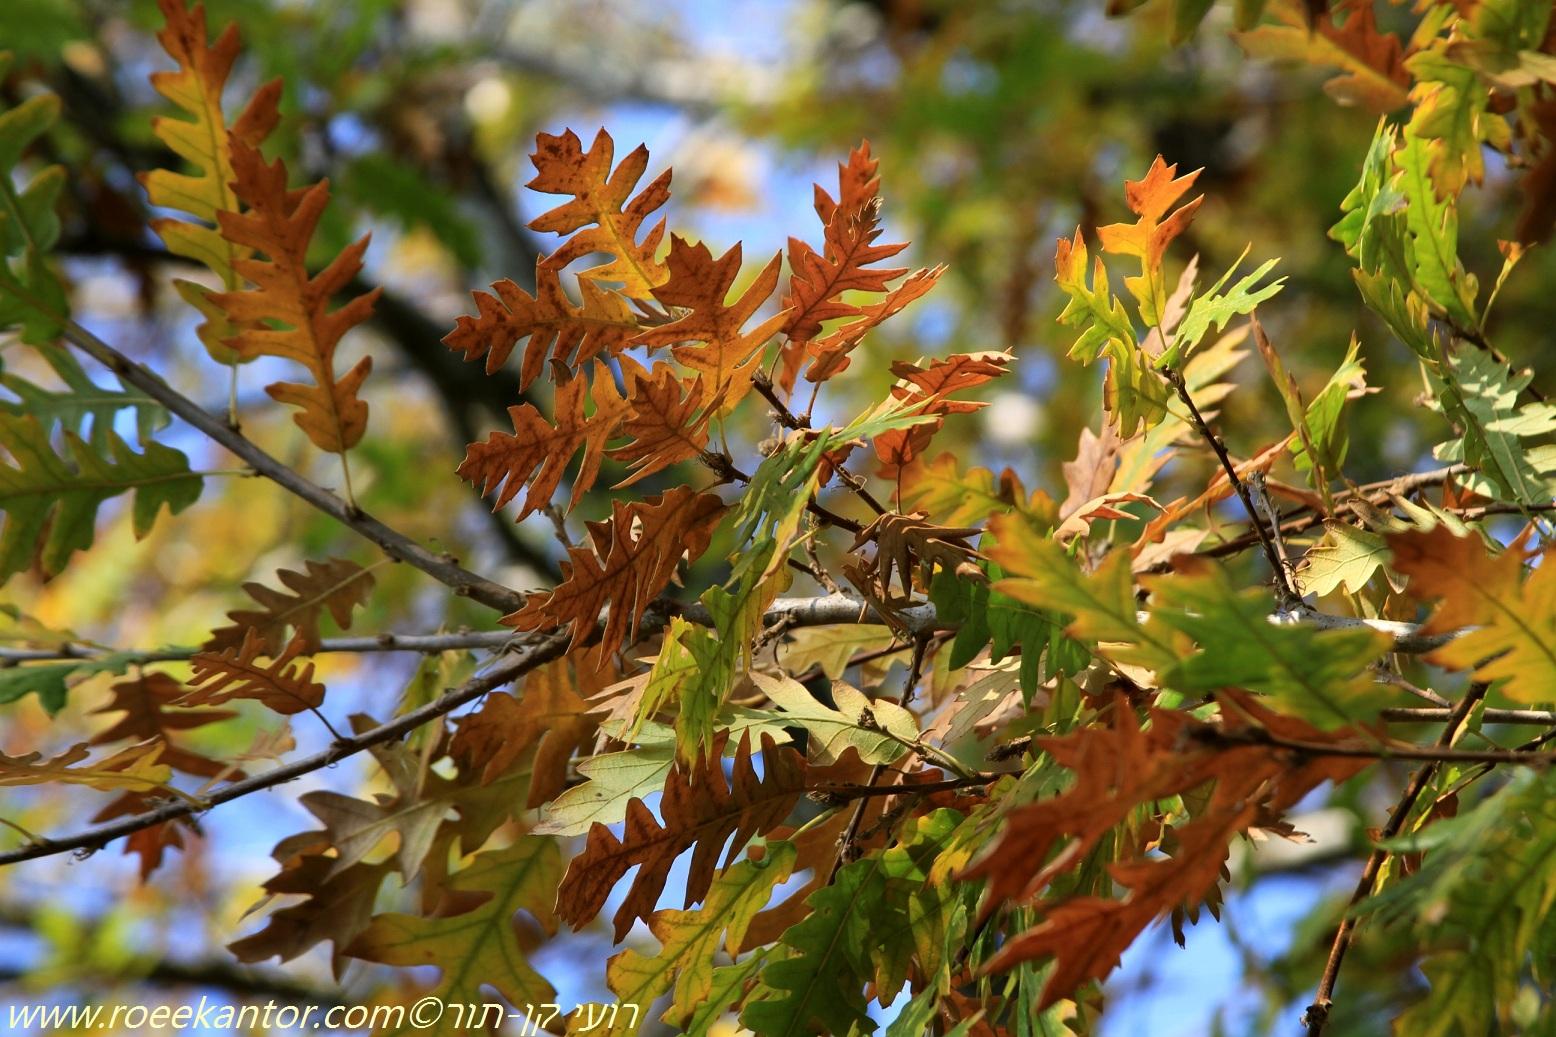 אלון שסוע Quercus cerris (6).JPG